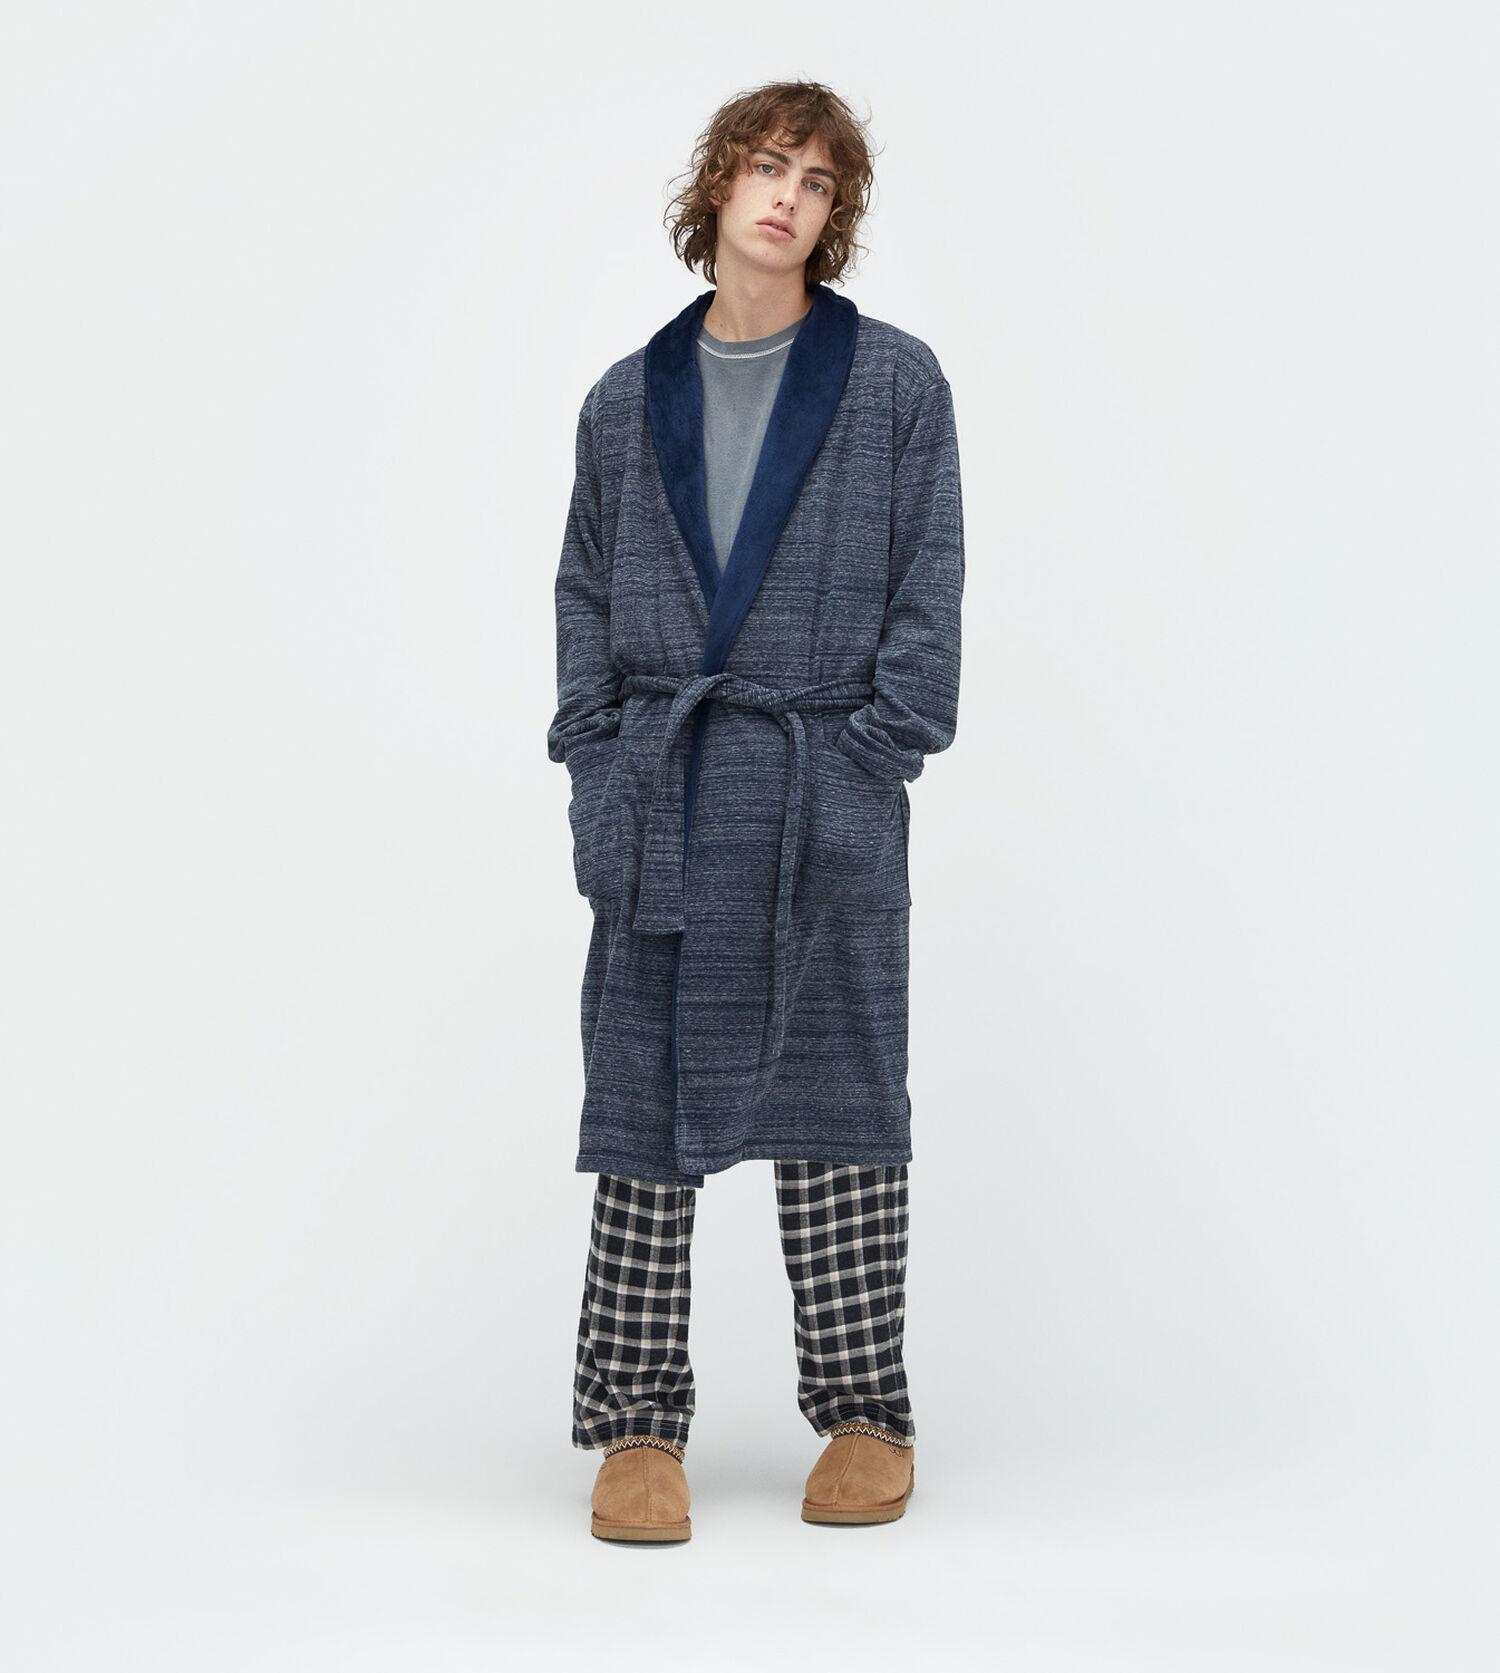 Zoom Robinson Robe - Image 1 of 3 ac7d1aa78